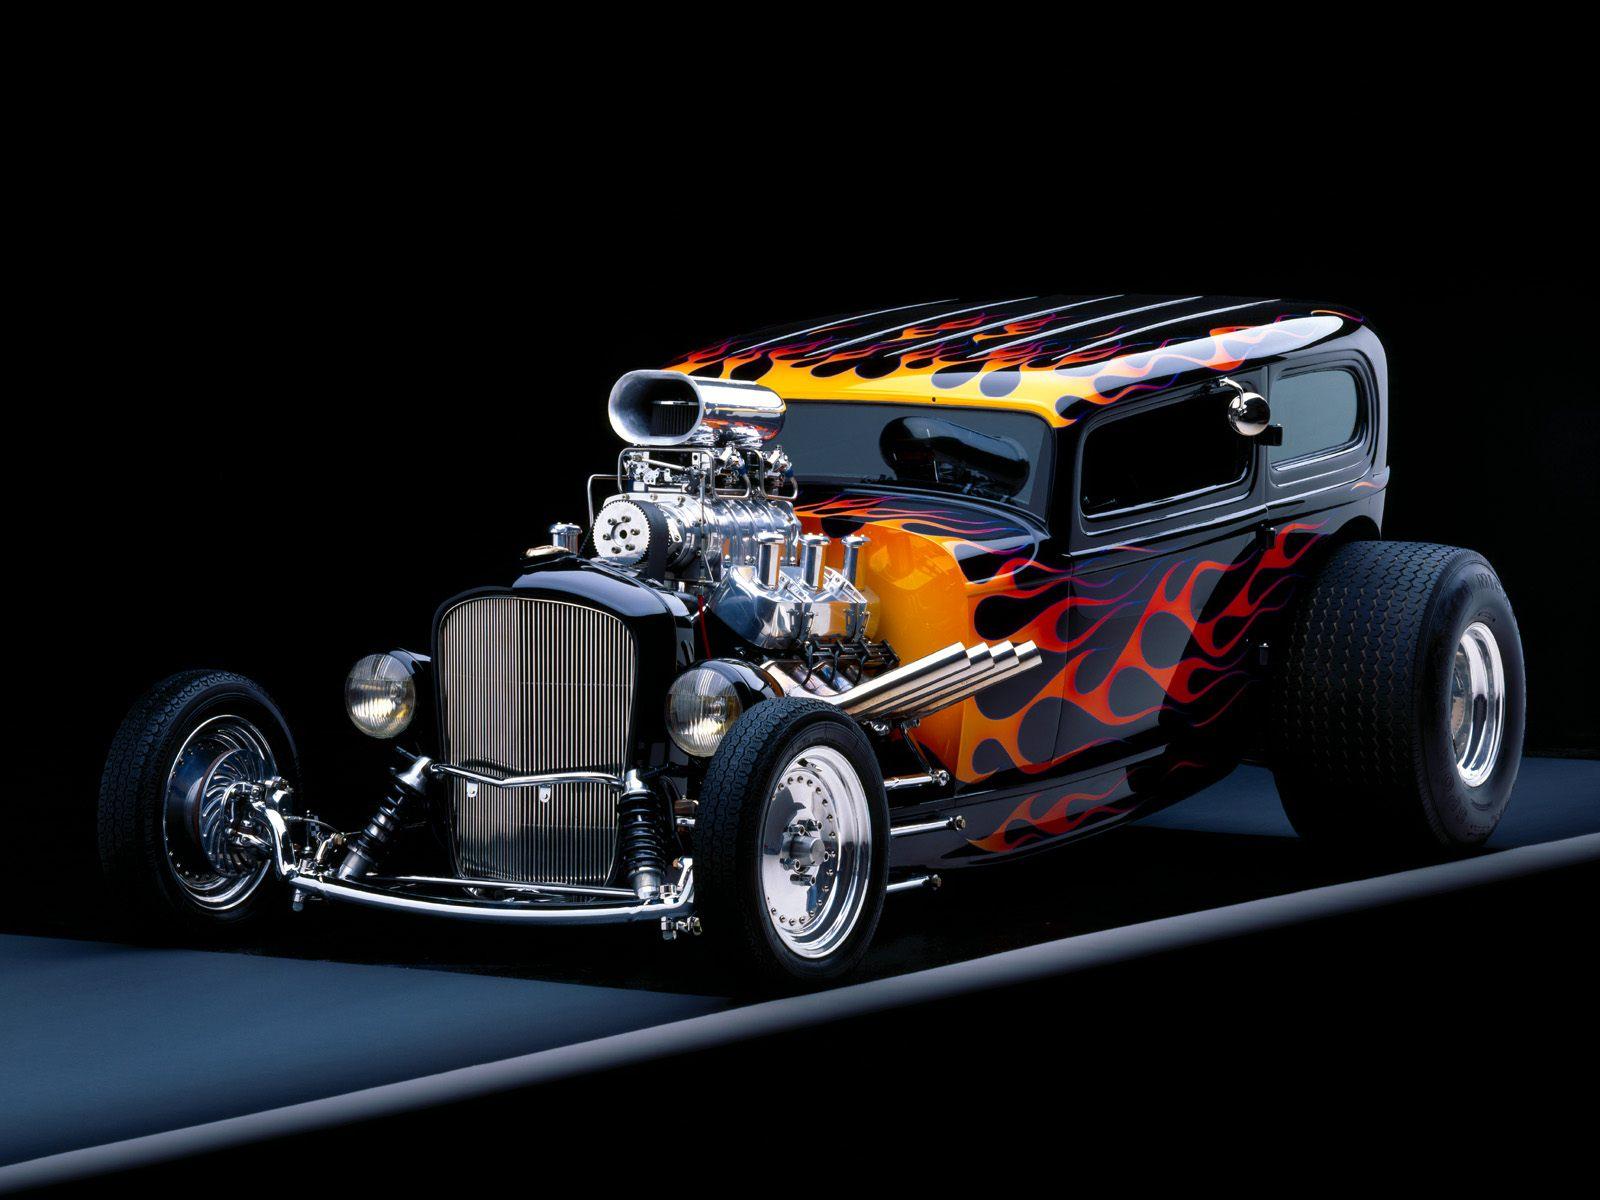 Wallpapers autos de carrera wallpapers de autos - Image de cars ...